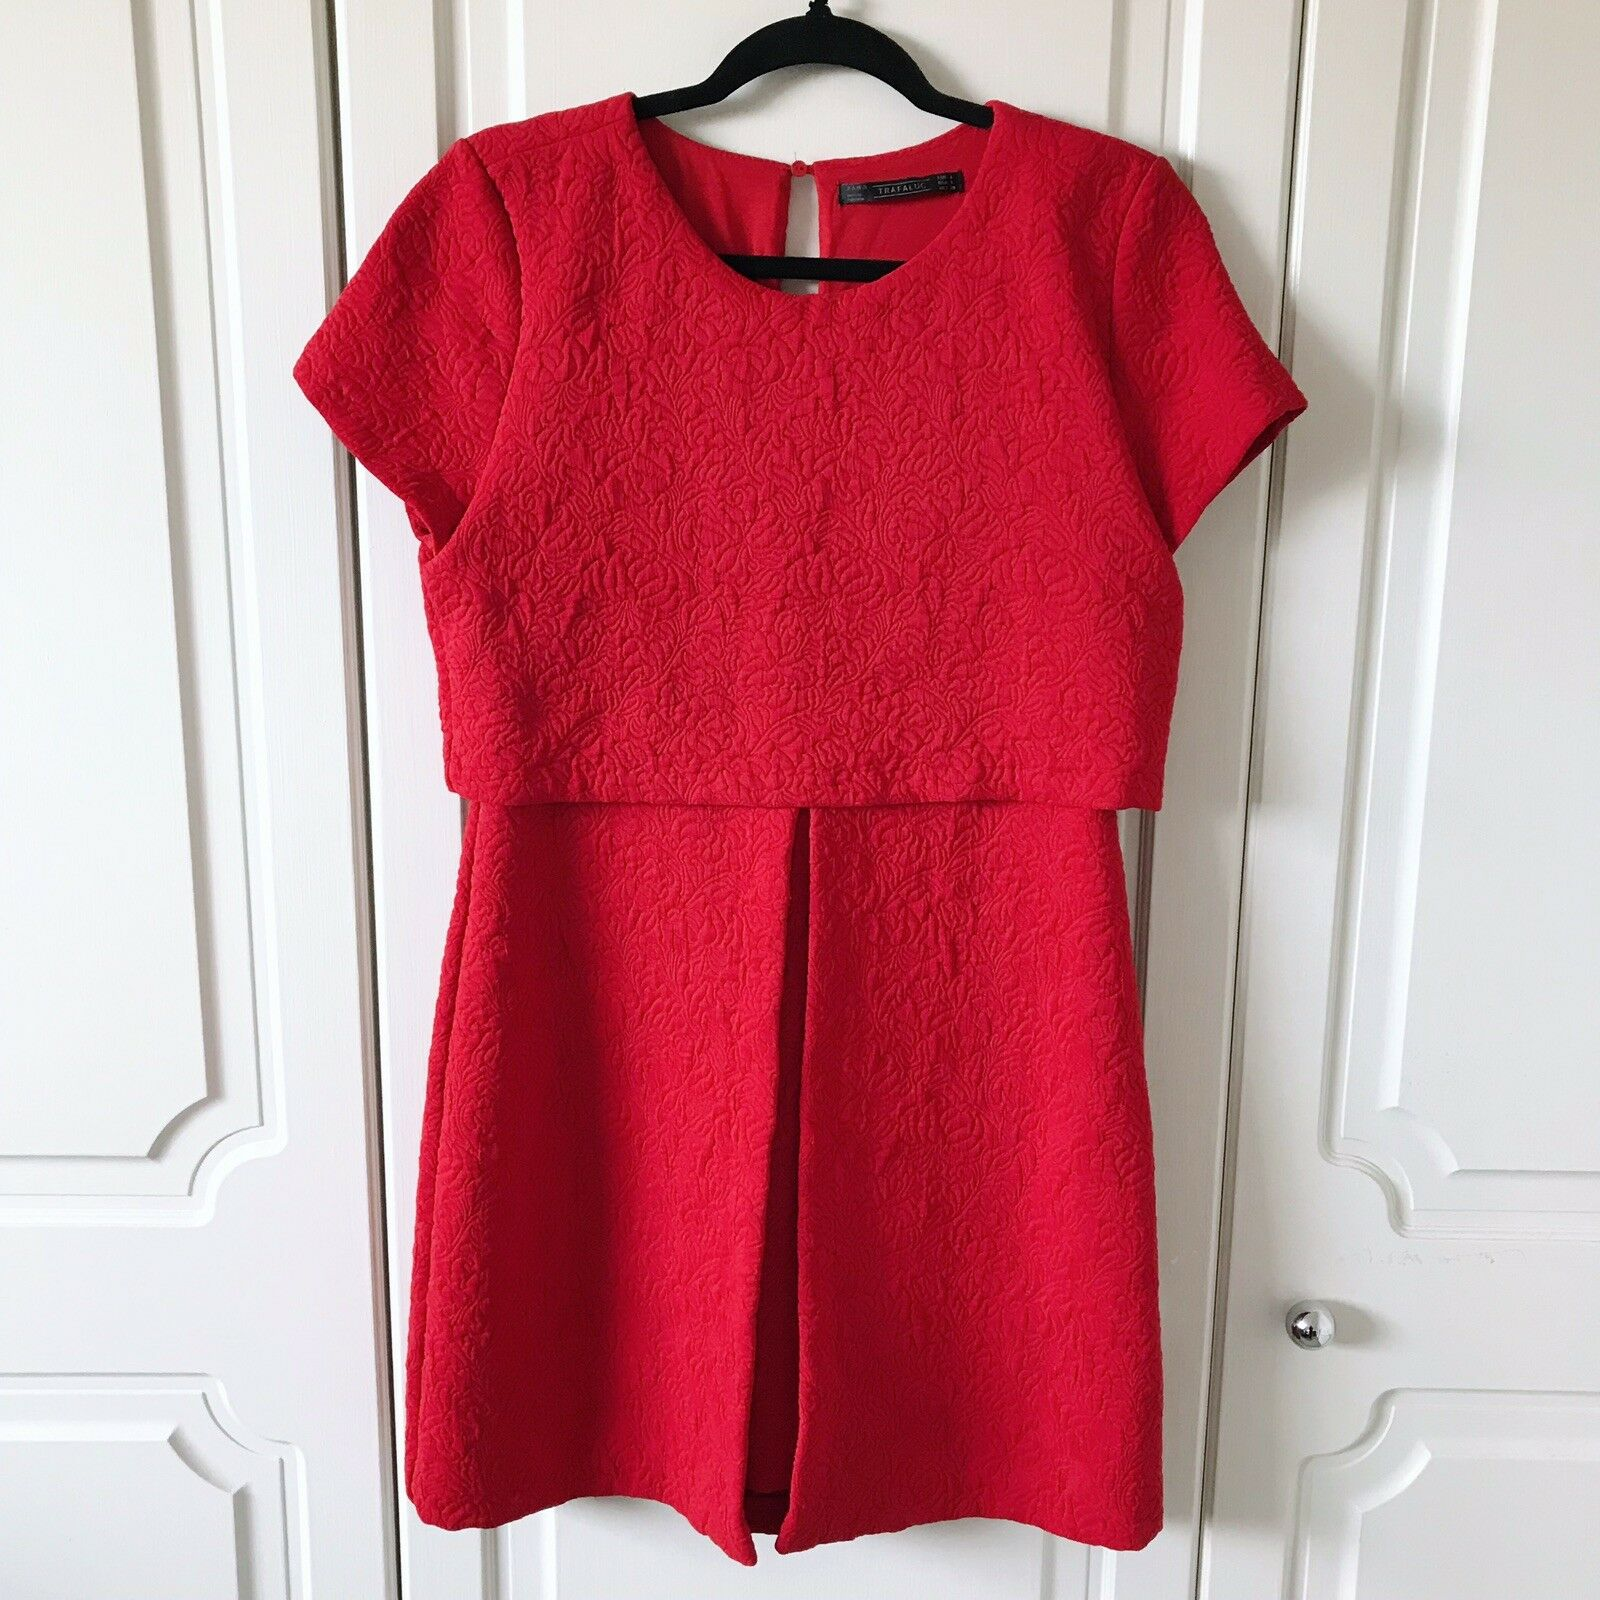 Zara Trafaluc Red Jacquard Layered Mini Dress Size L   VGC Wedding   Races